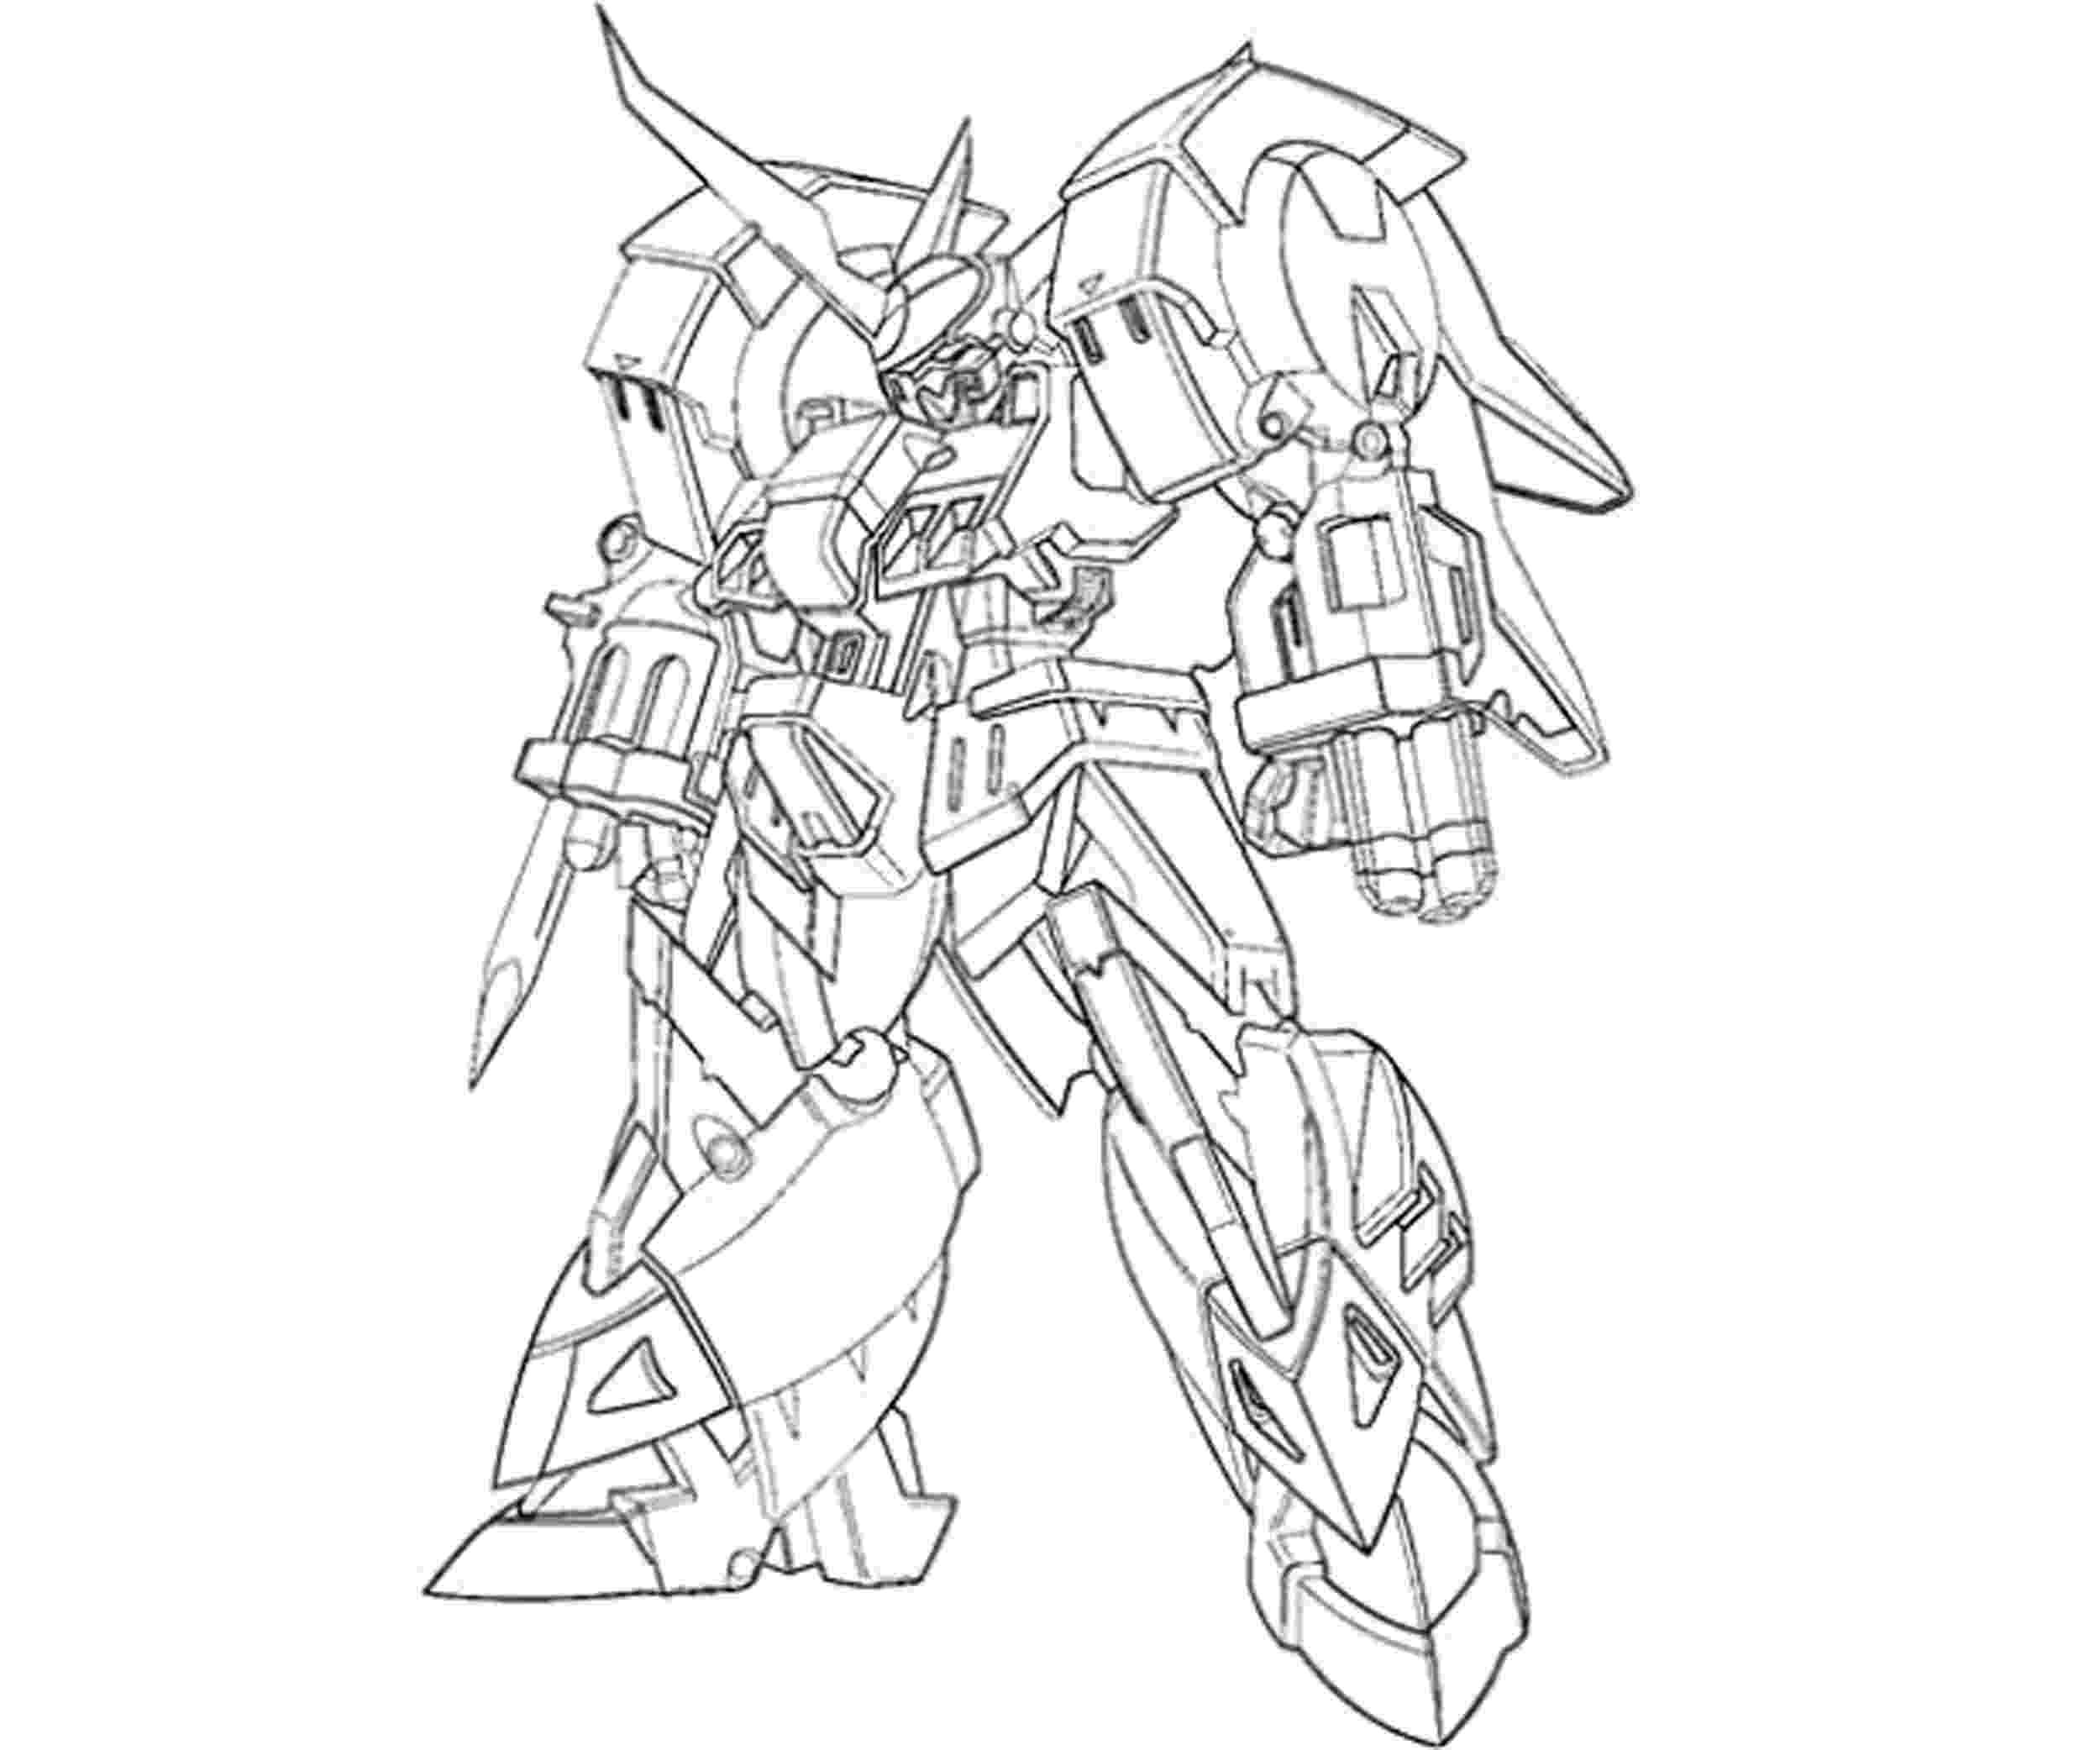 transformers coloring transformers coloring pages coloring pages to download transformers coloring